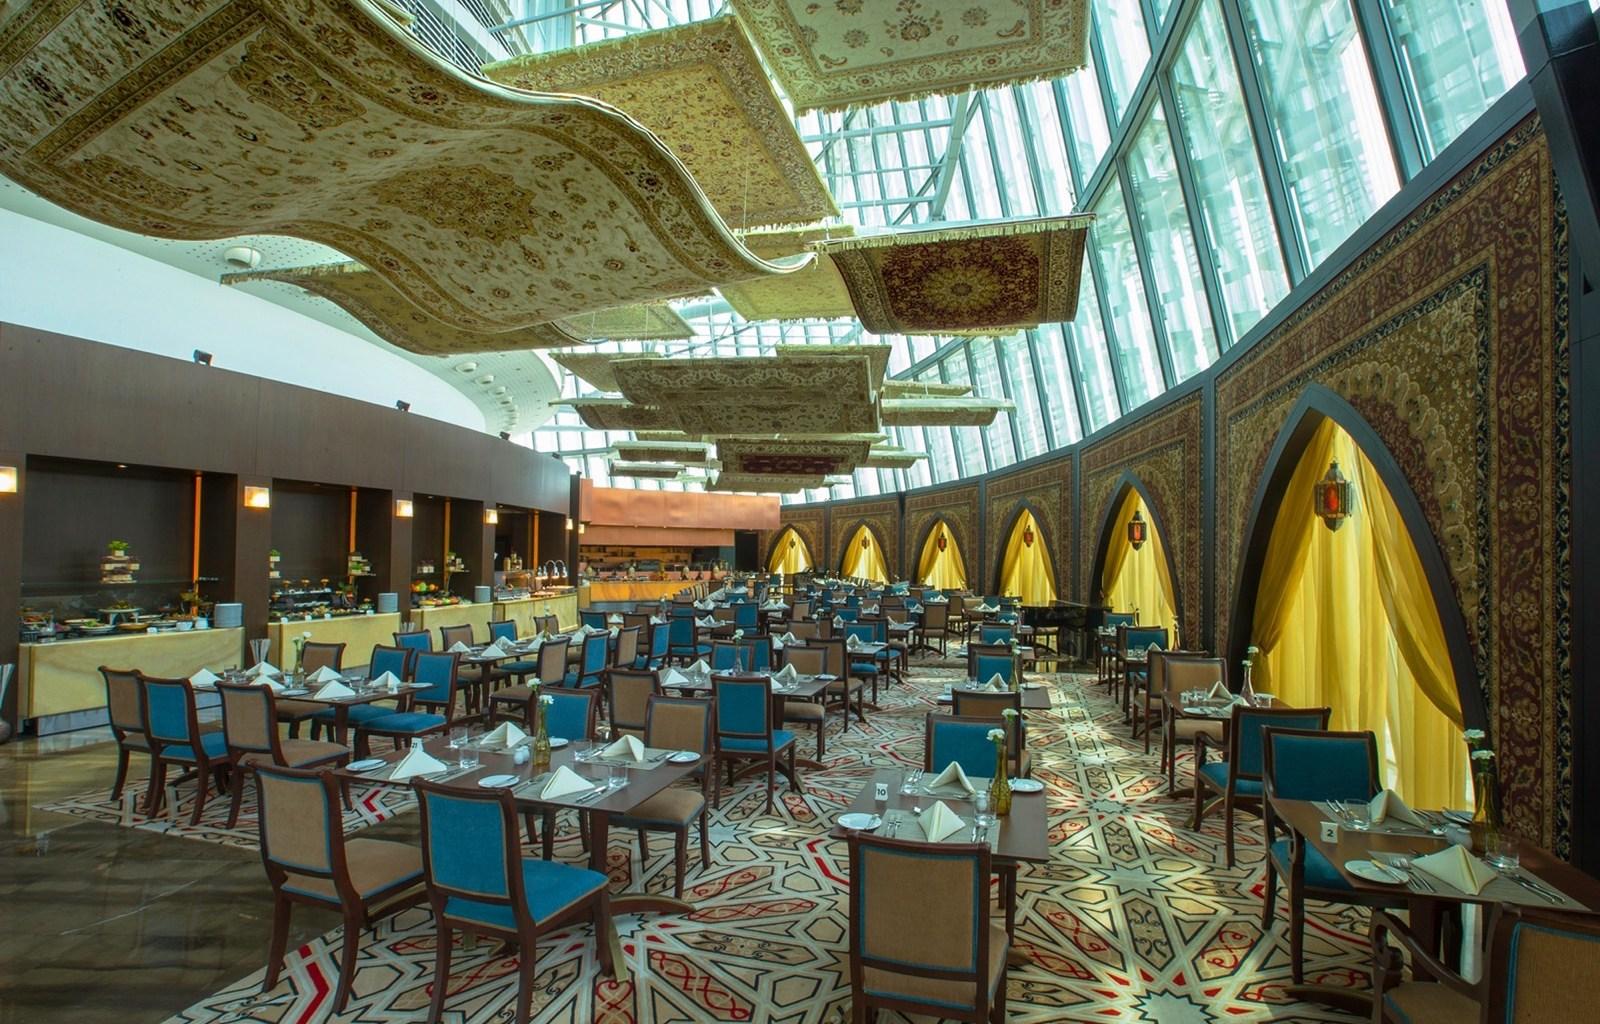 YSK Furniture contemporary custom restaurant furniture luxury ship furniture-1